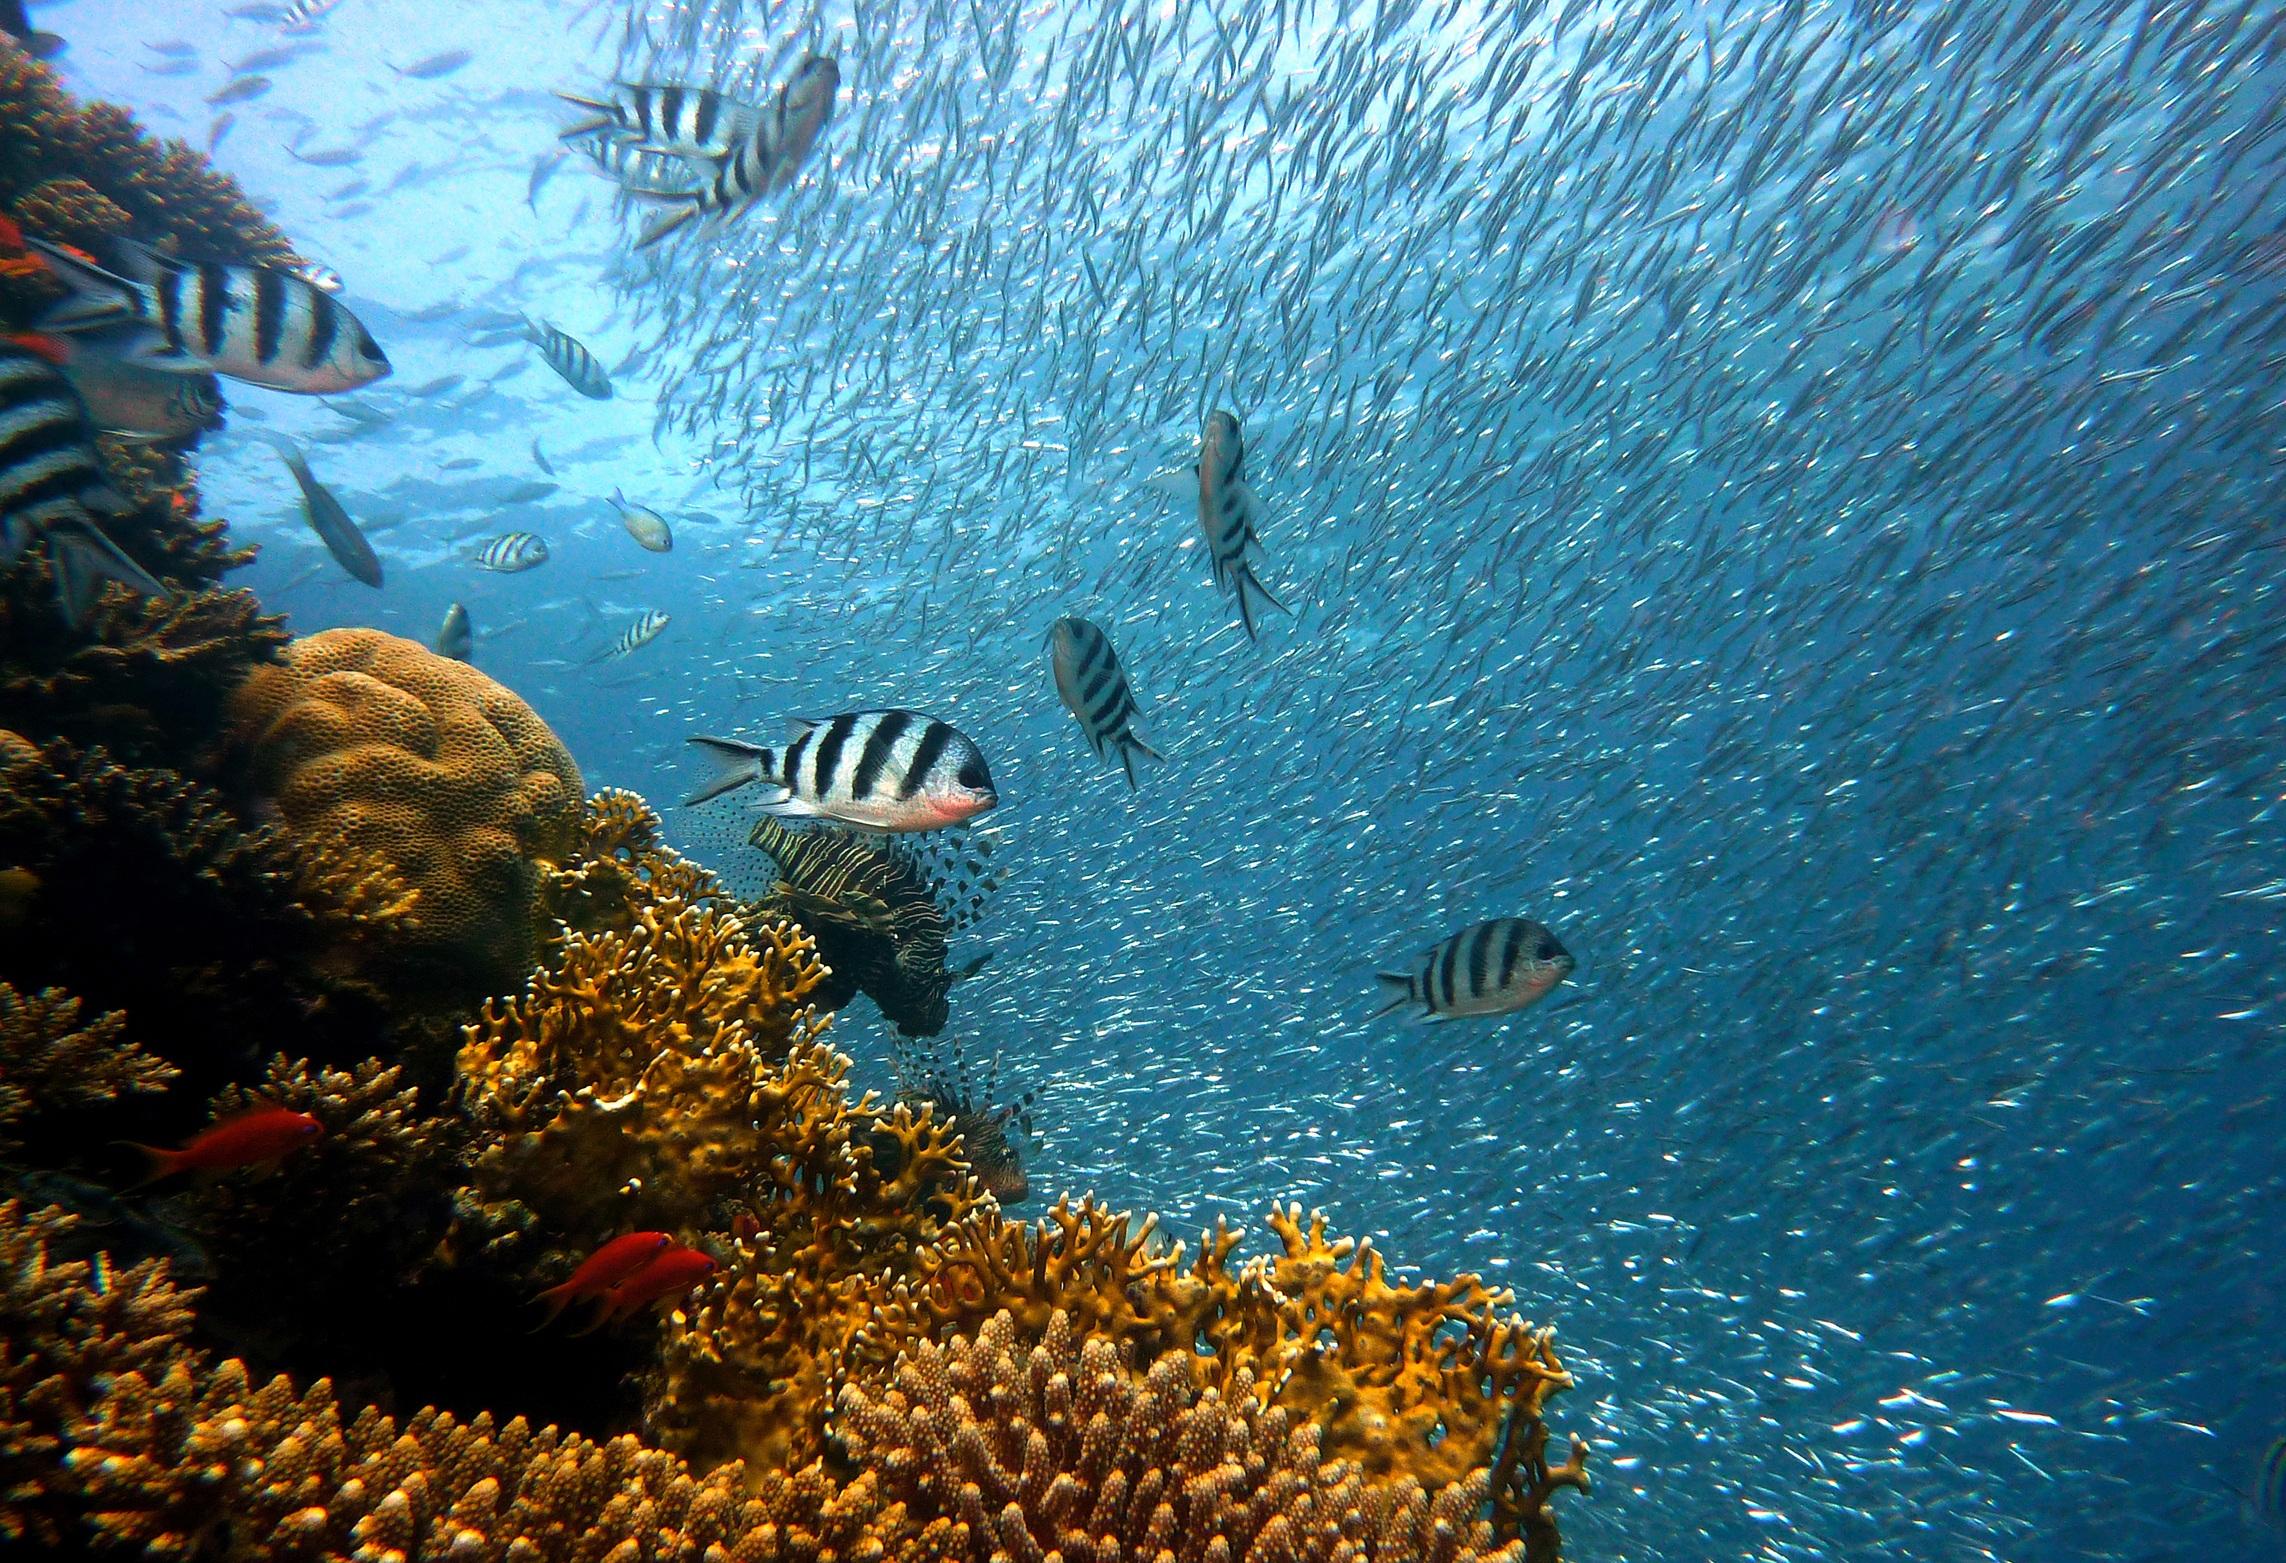 Рыба, Коралл, Банк, Арресифе, Море - Обои HD - Профессор falken.com